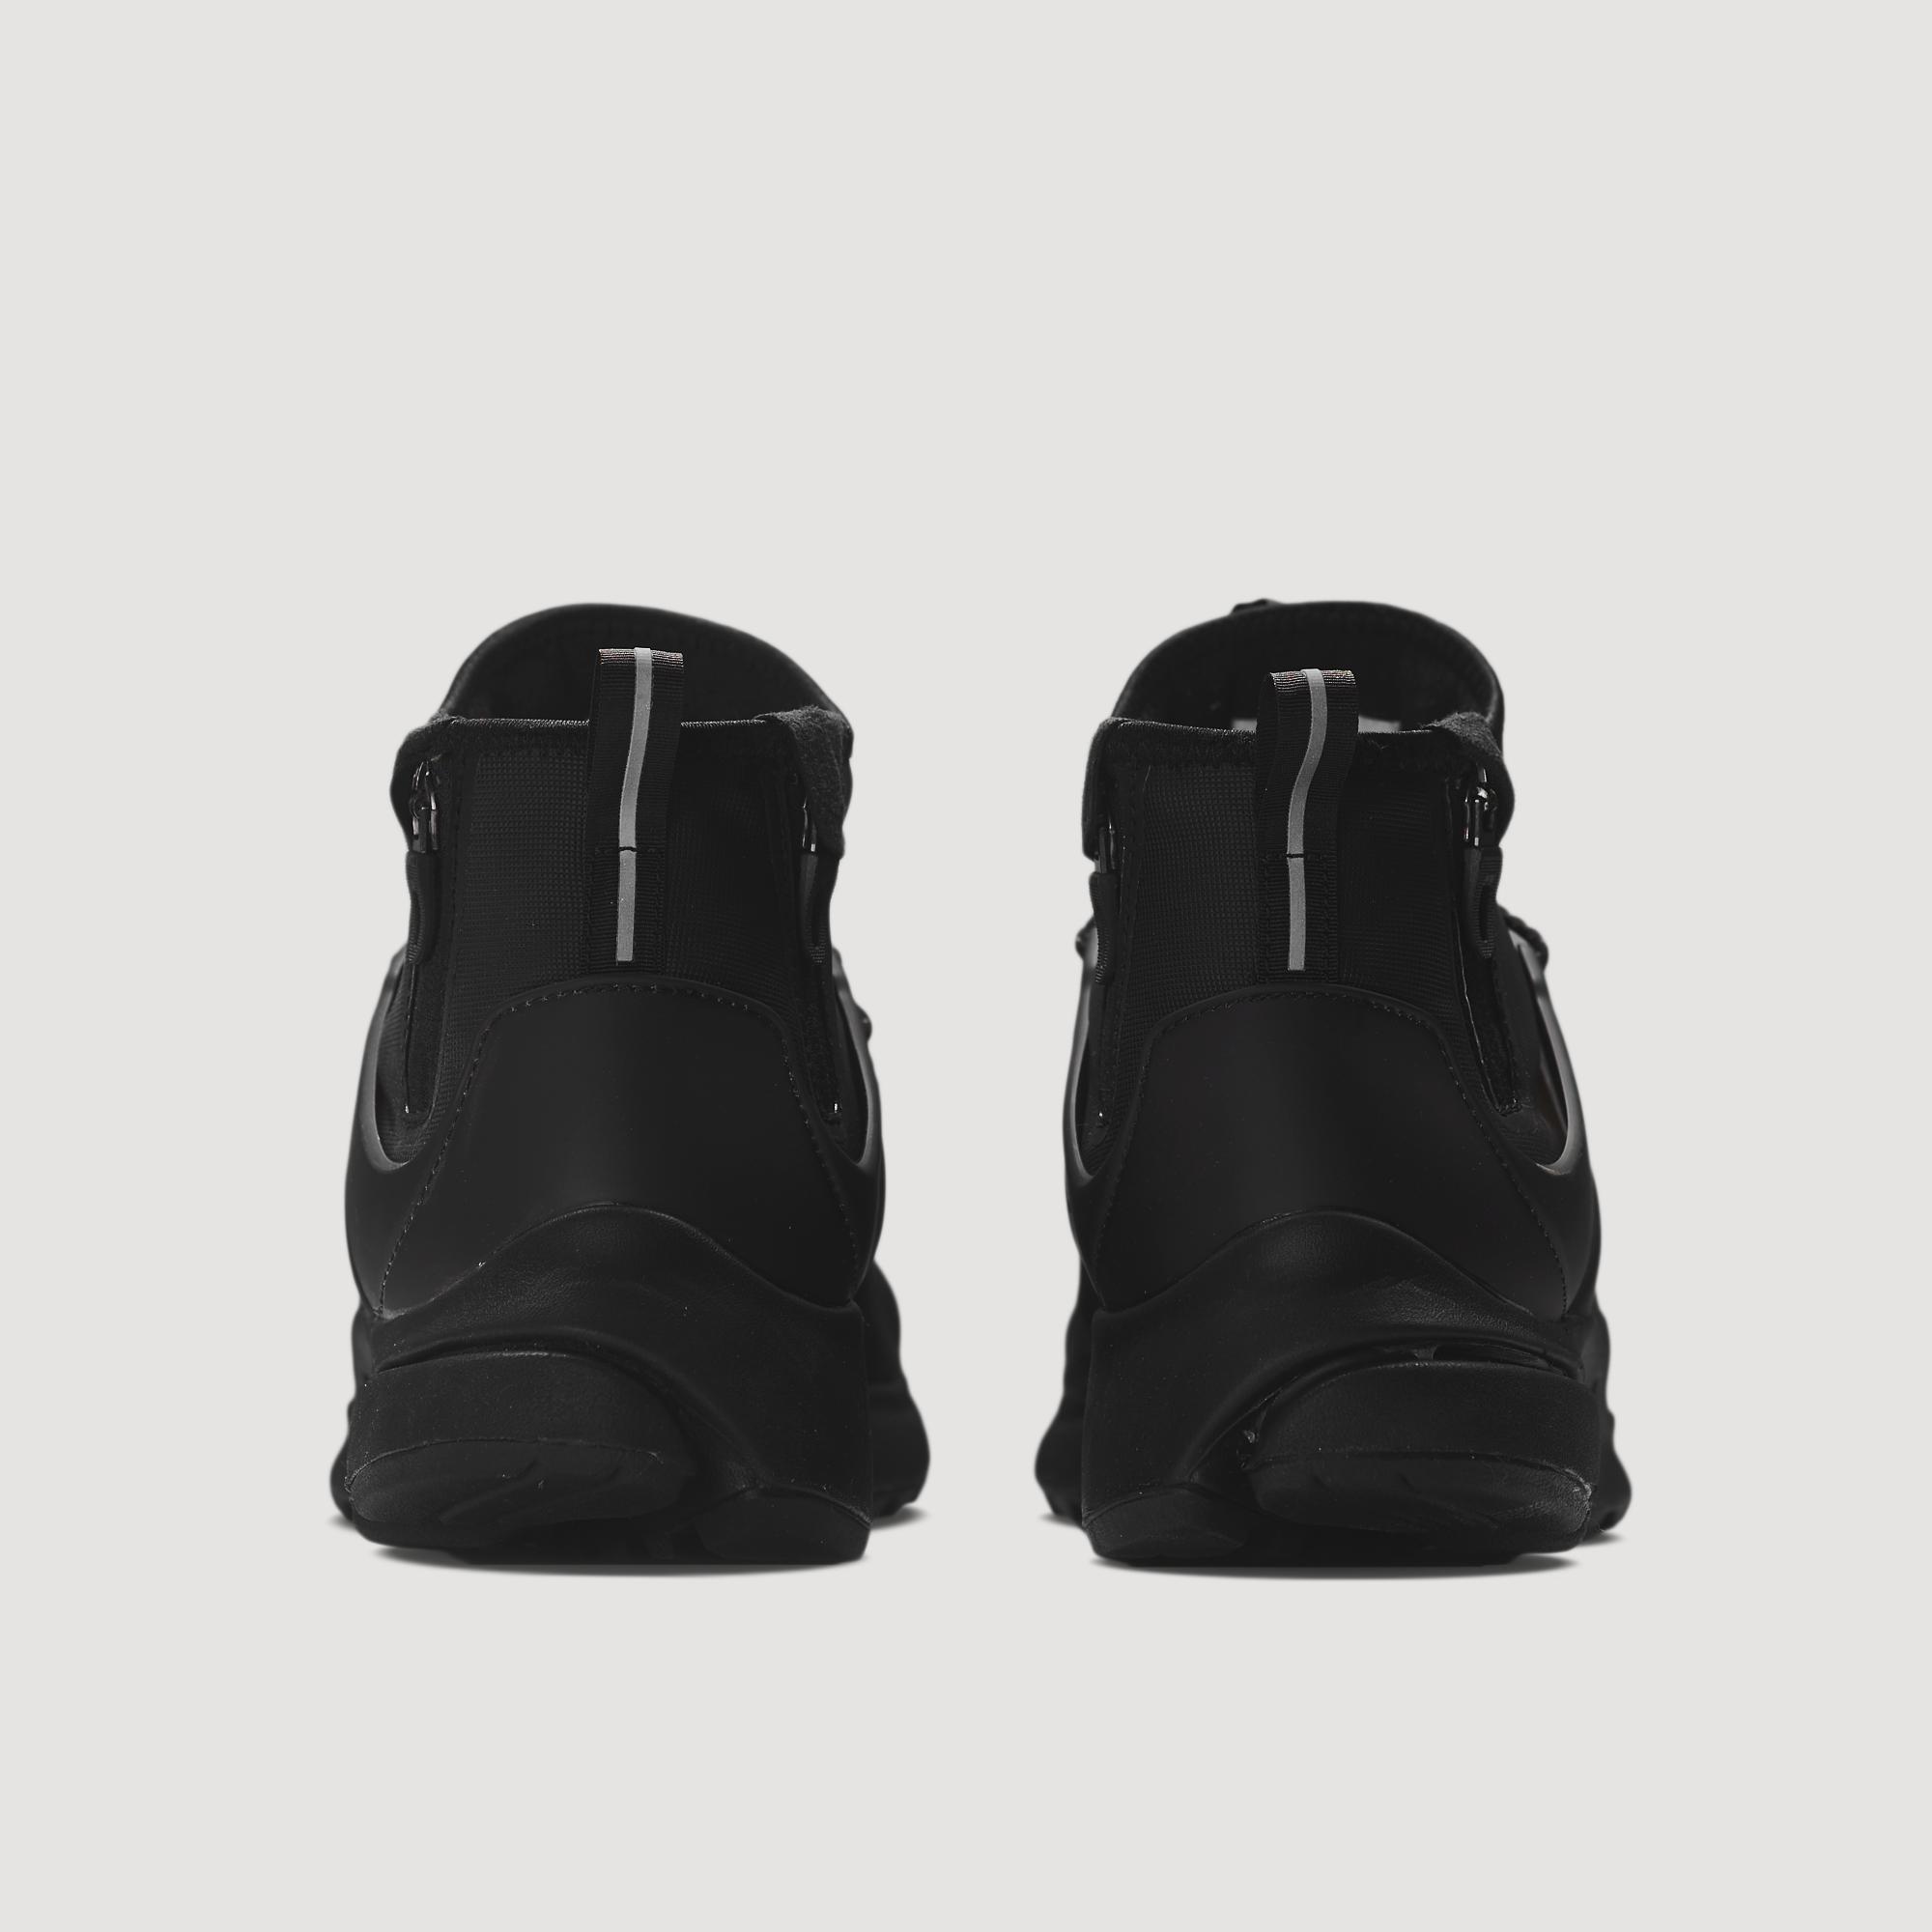 Pig Presto Shoe Top Mid Férfi Cipő Shoes Utility Air 1awqgSCg